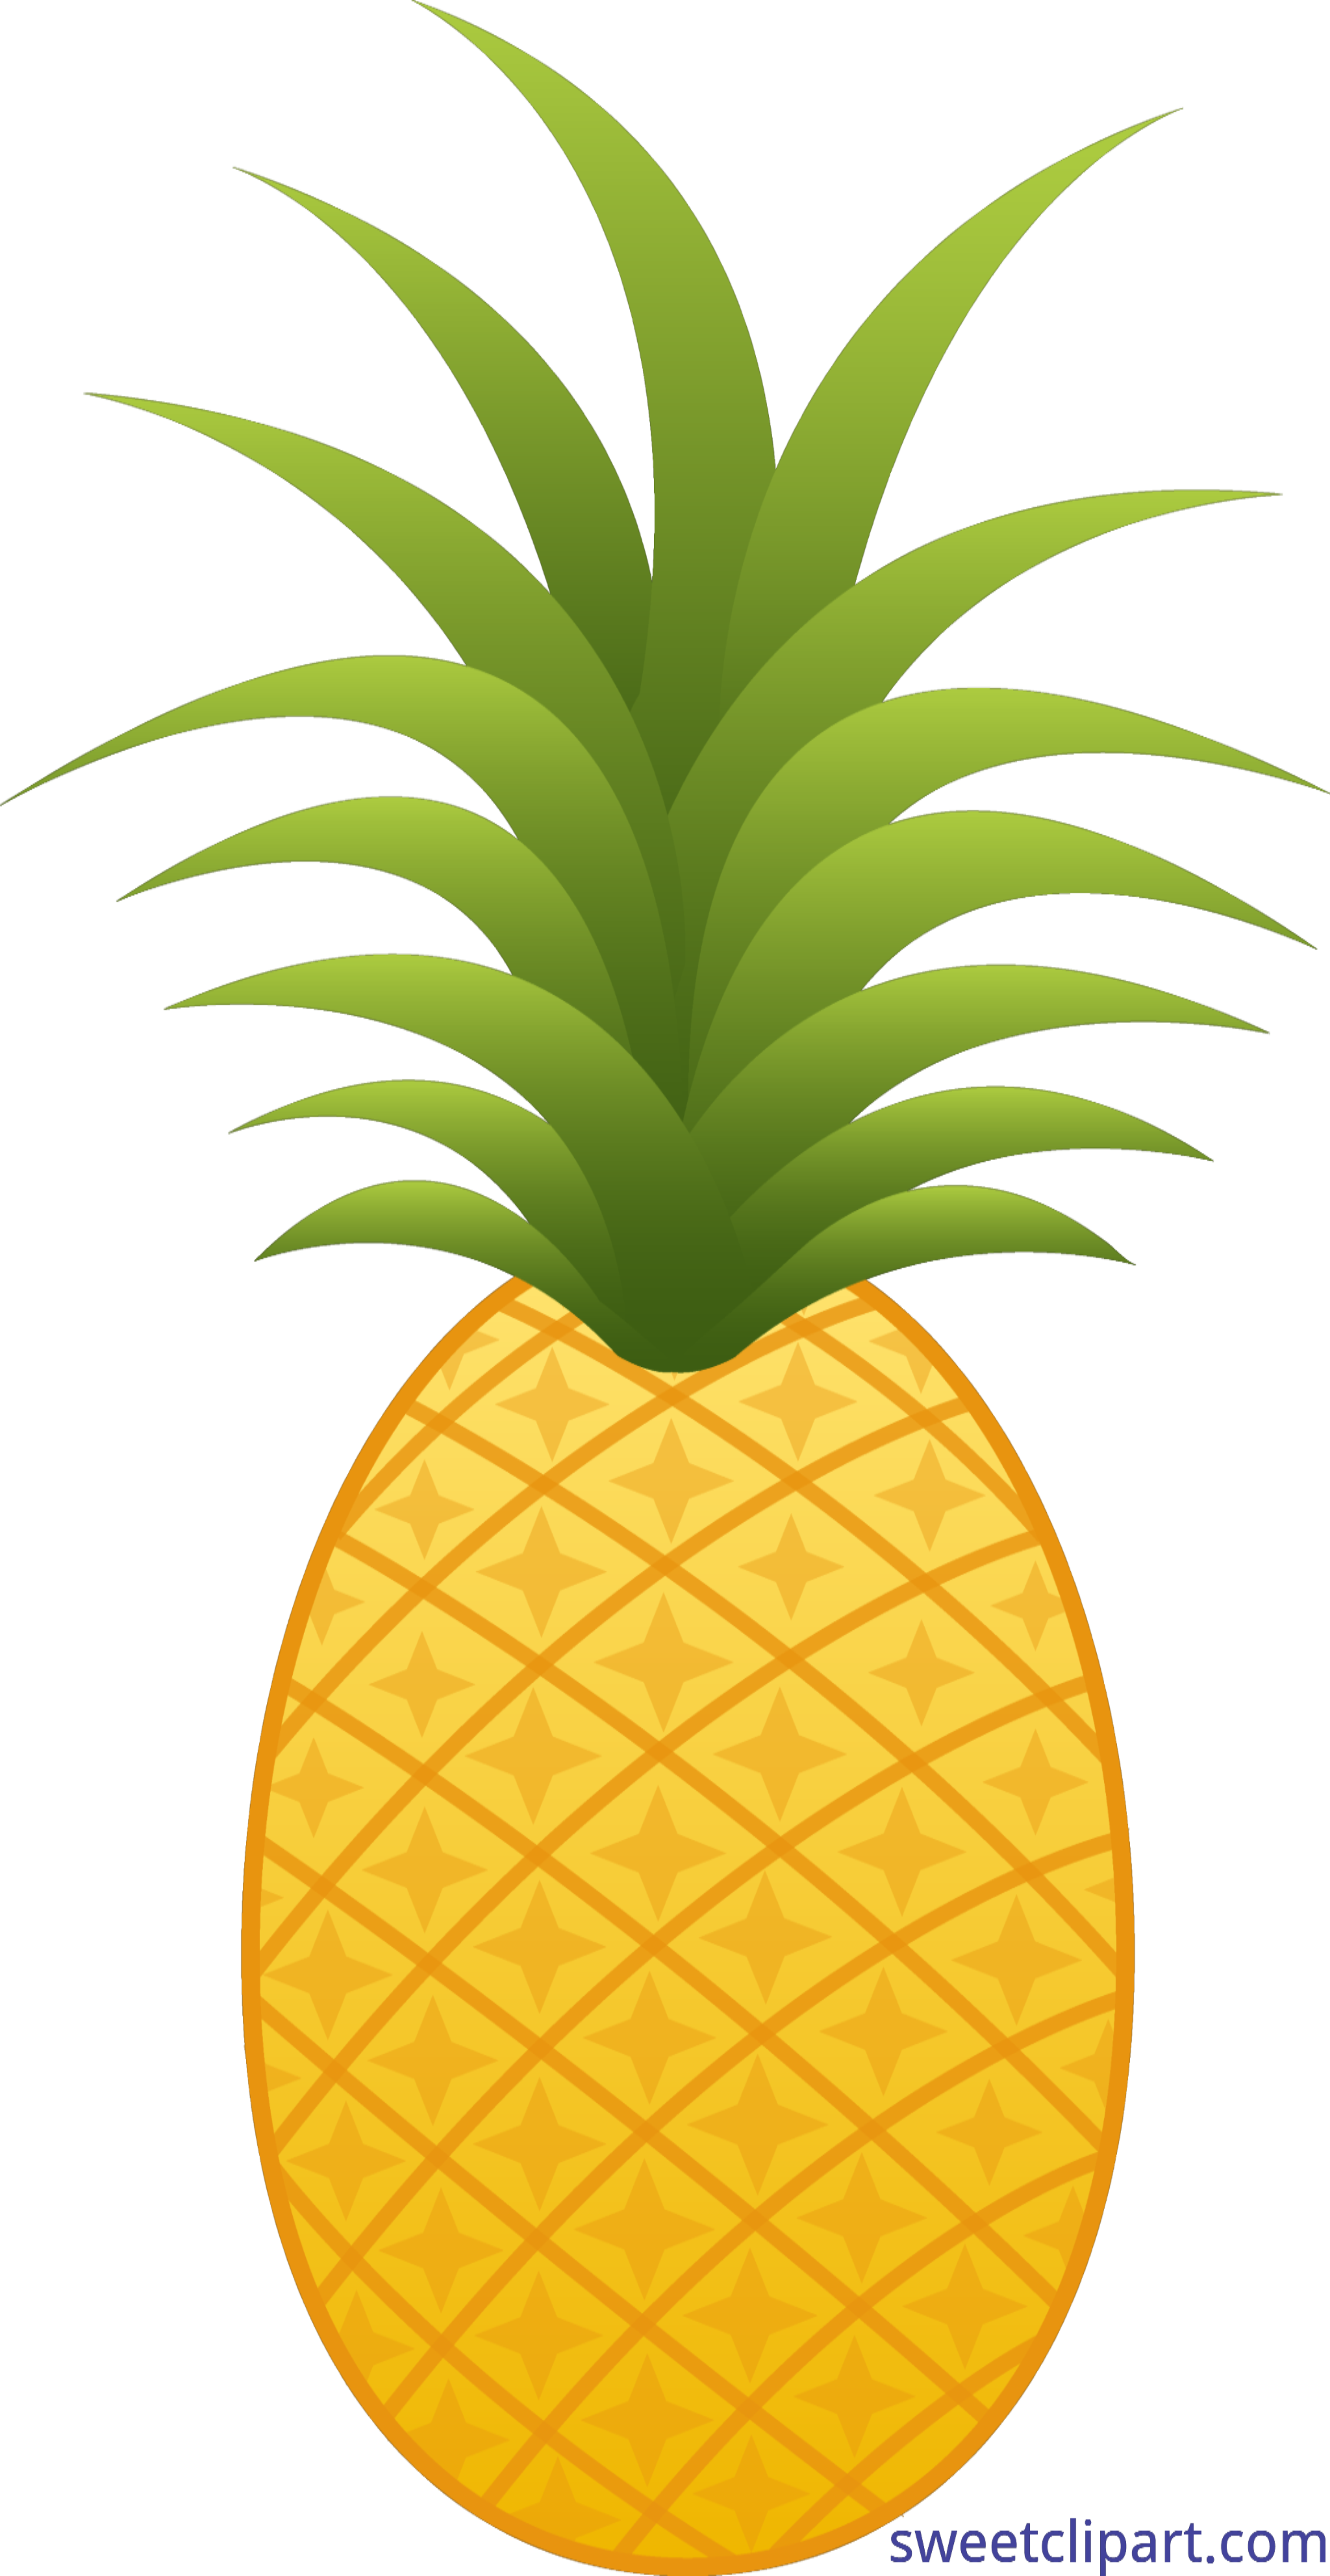 Clip sweet. Pineapple clipart line art